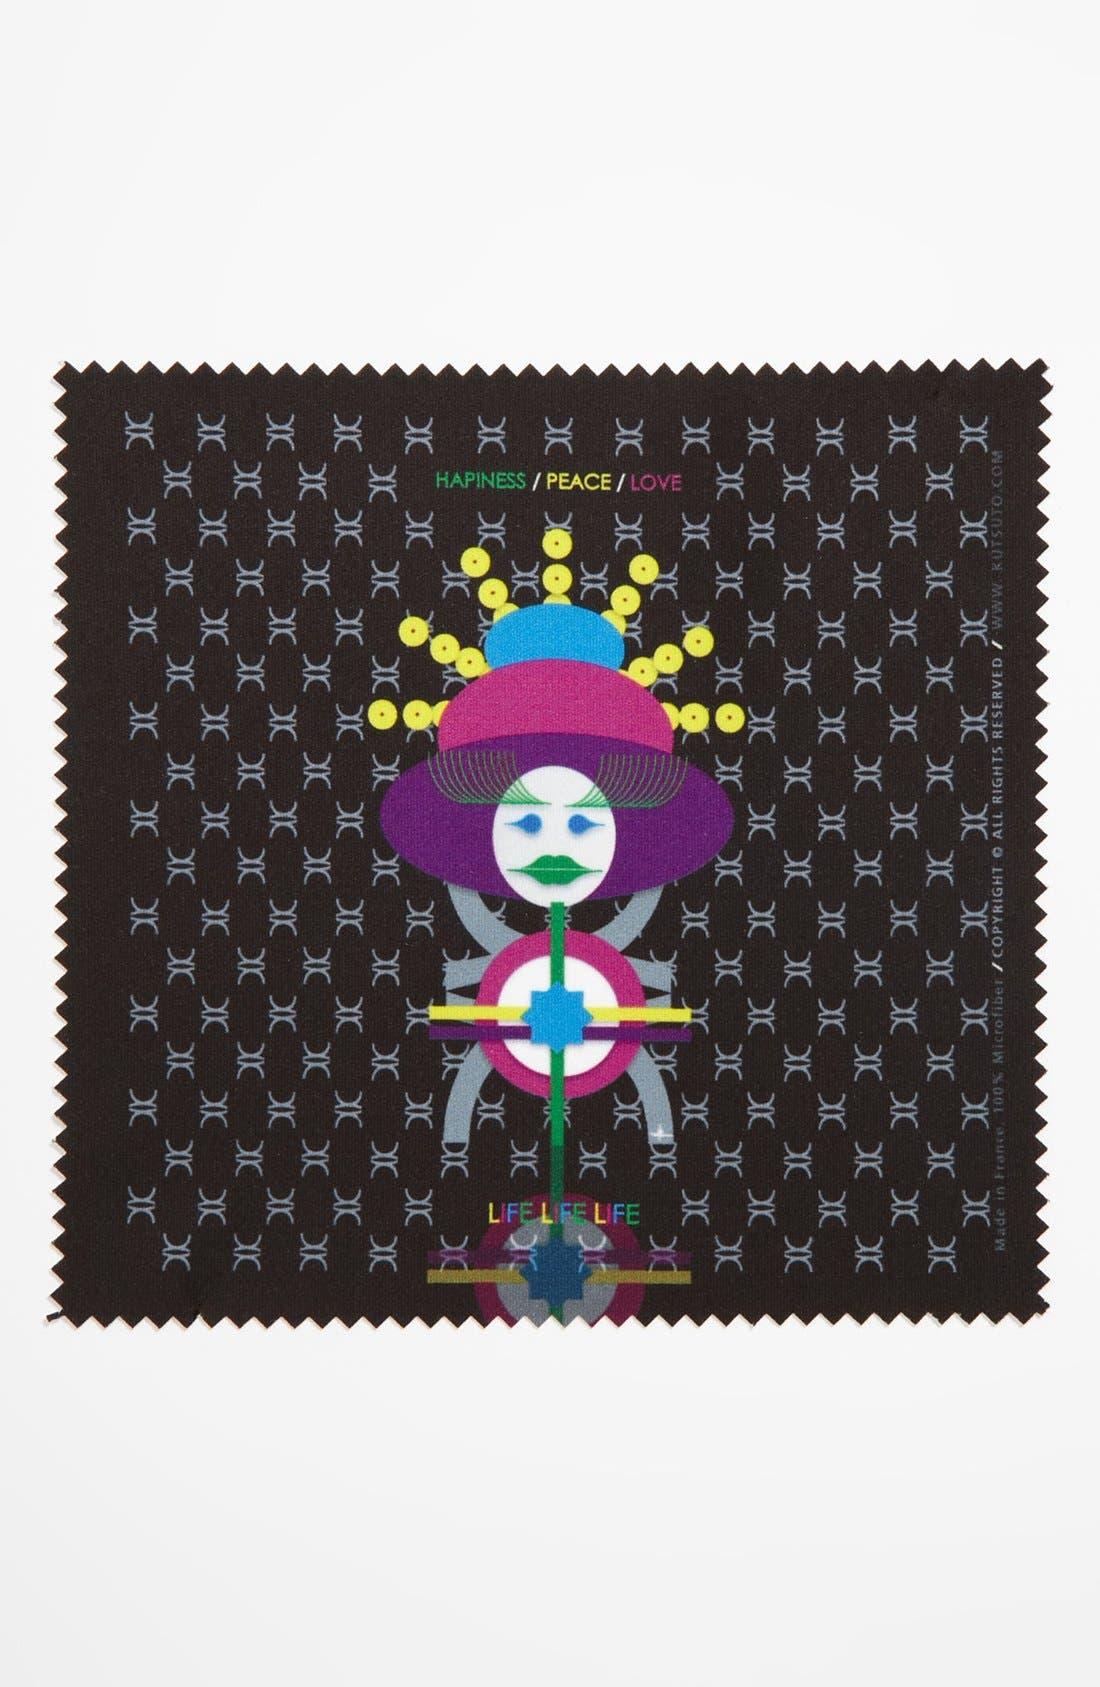 Alternate Image 1 Selected - KUTSUTO 'Kutsinette - Life Life Life' Microfiber Cloth